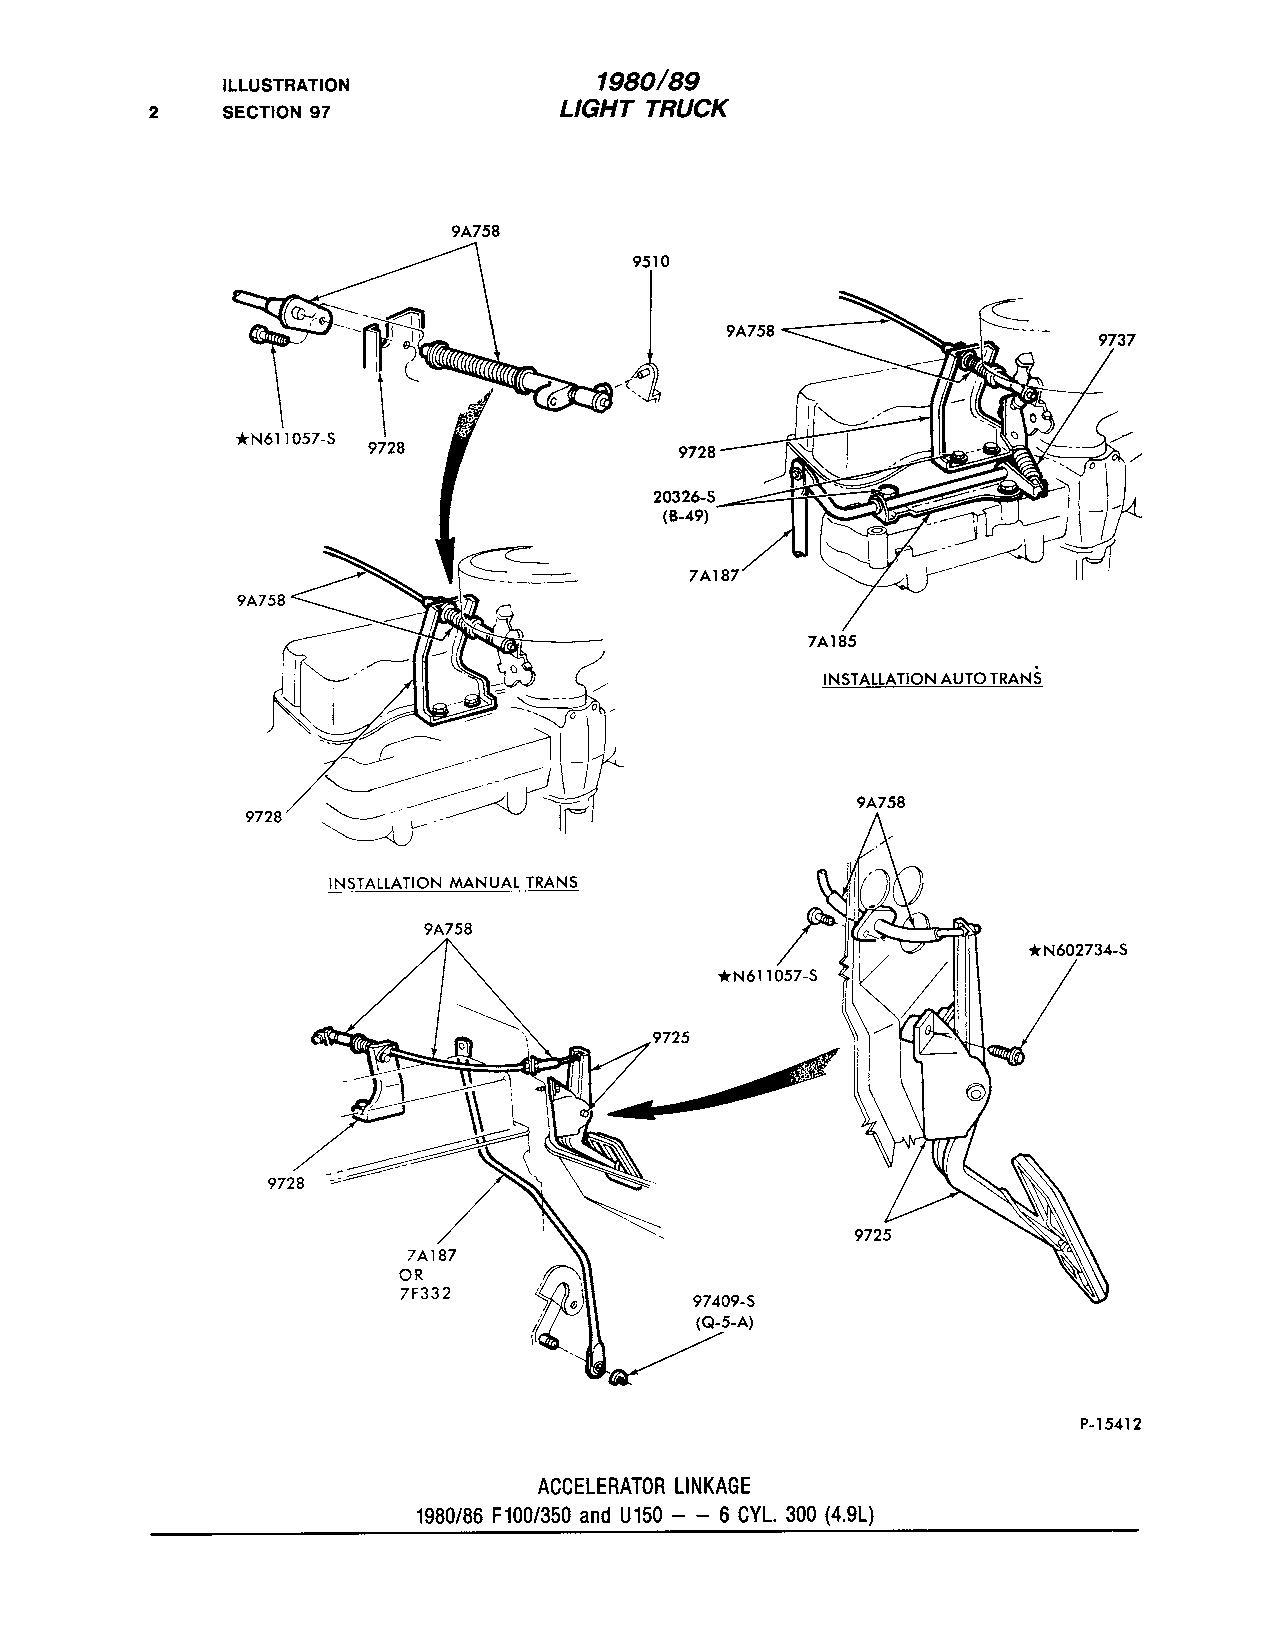 No Shift Arm Assembly C6 Trans